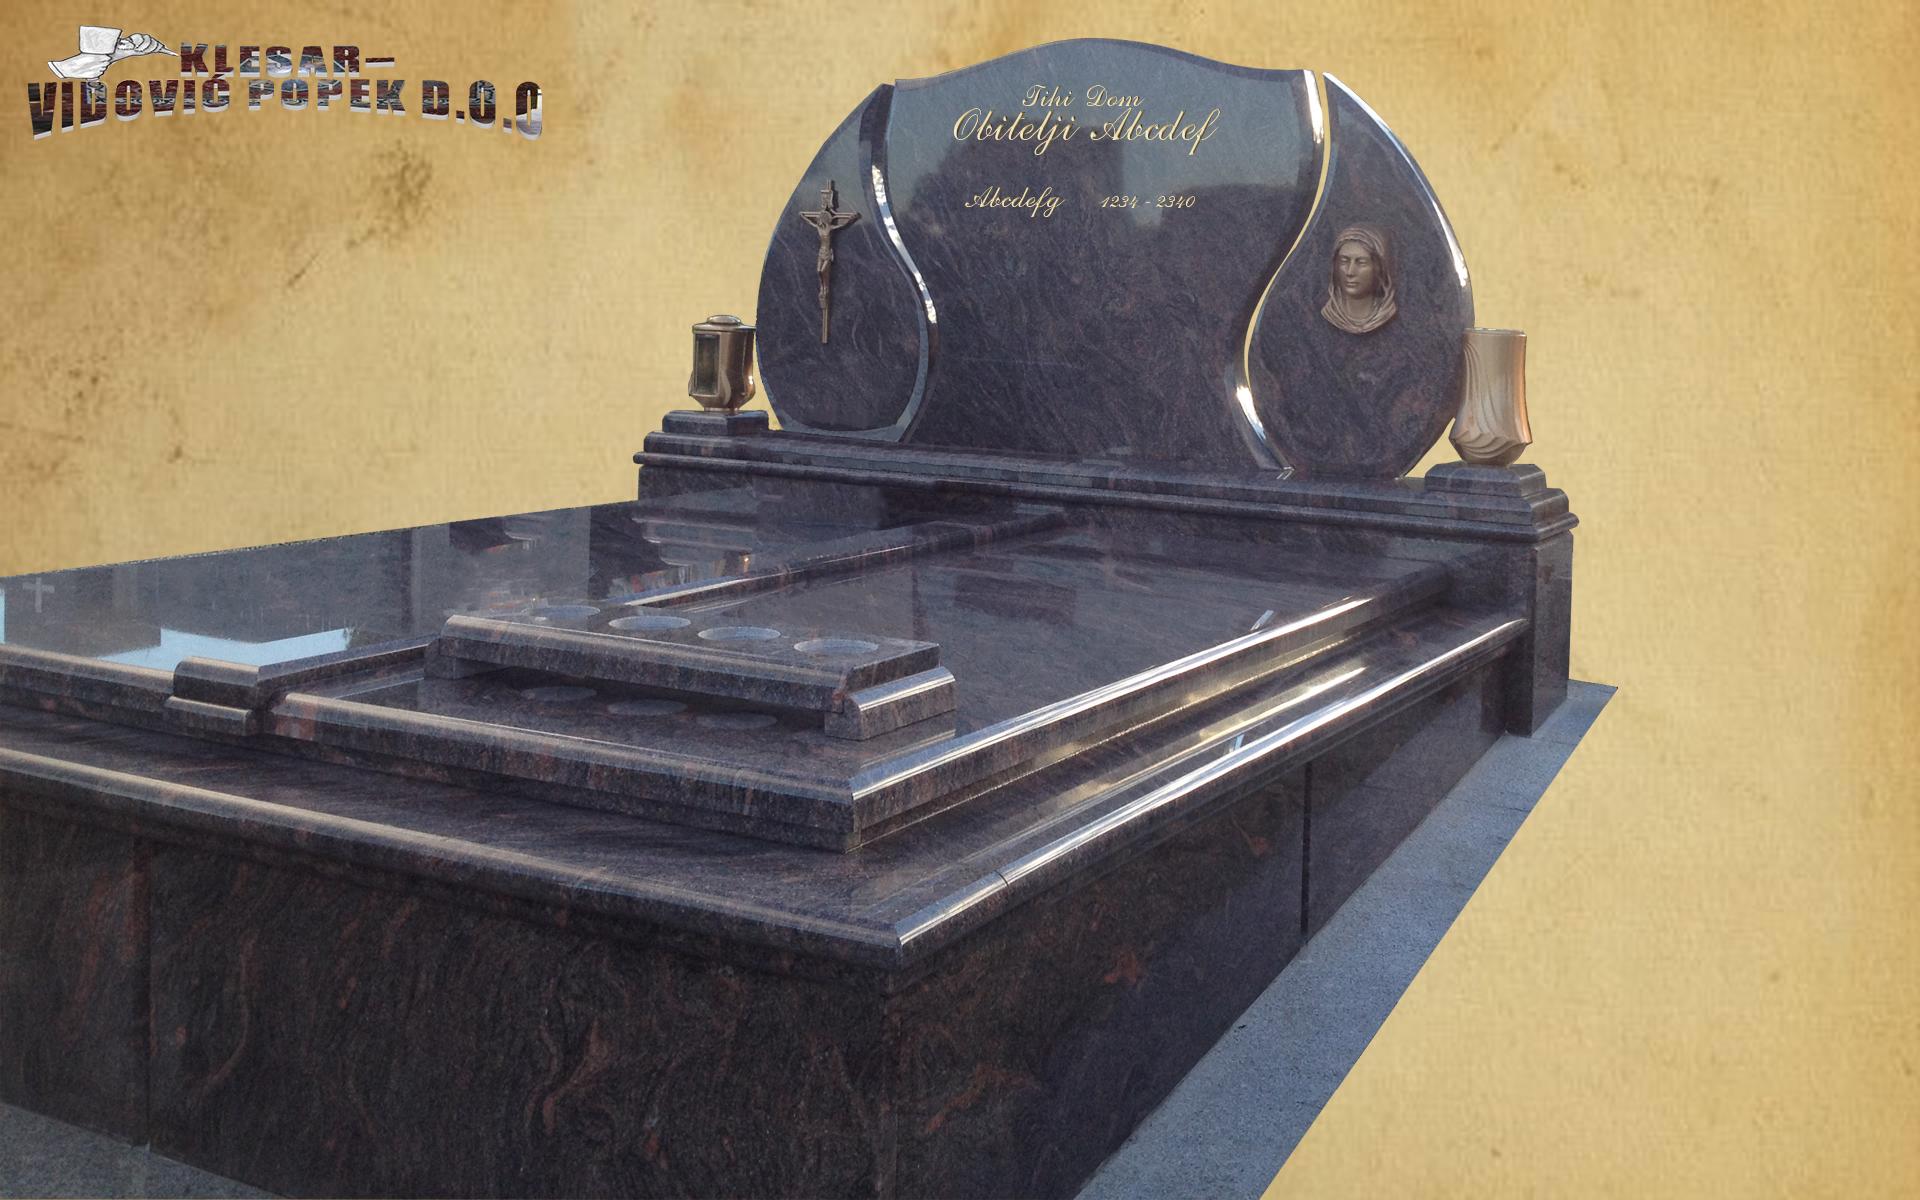 spomenik 6211.jpg